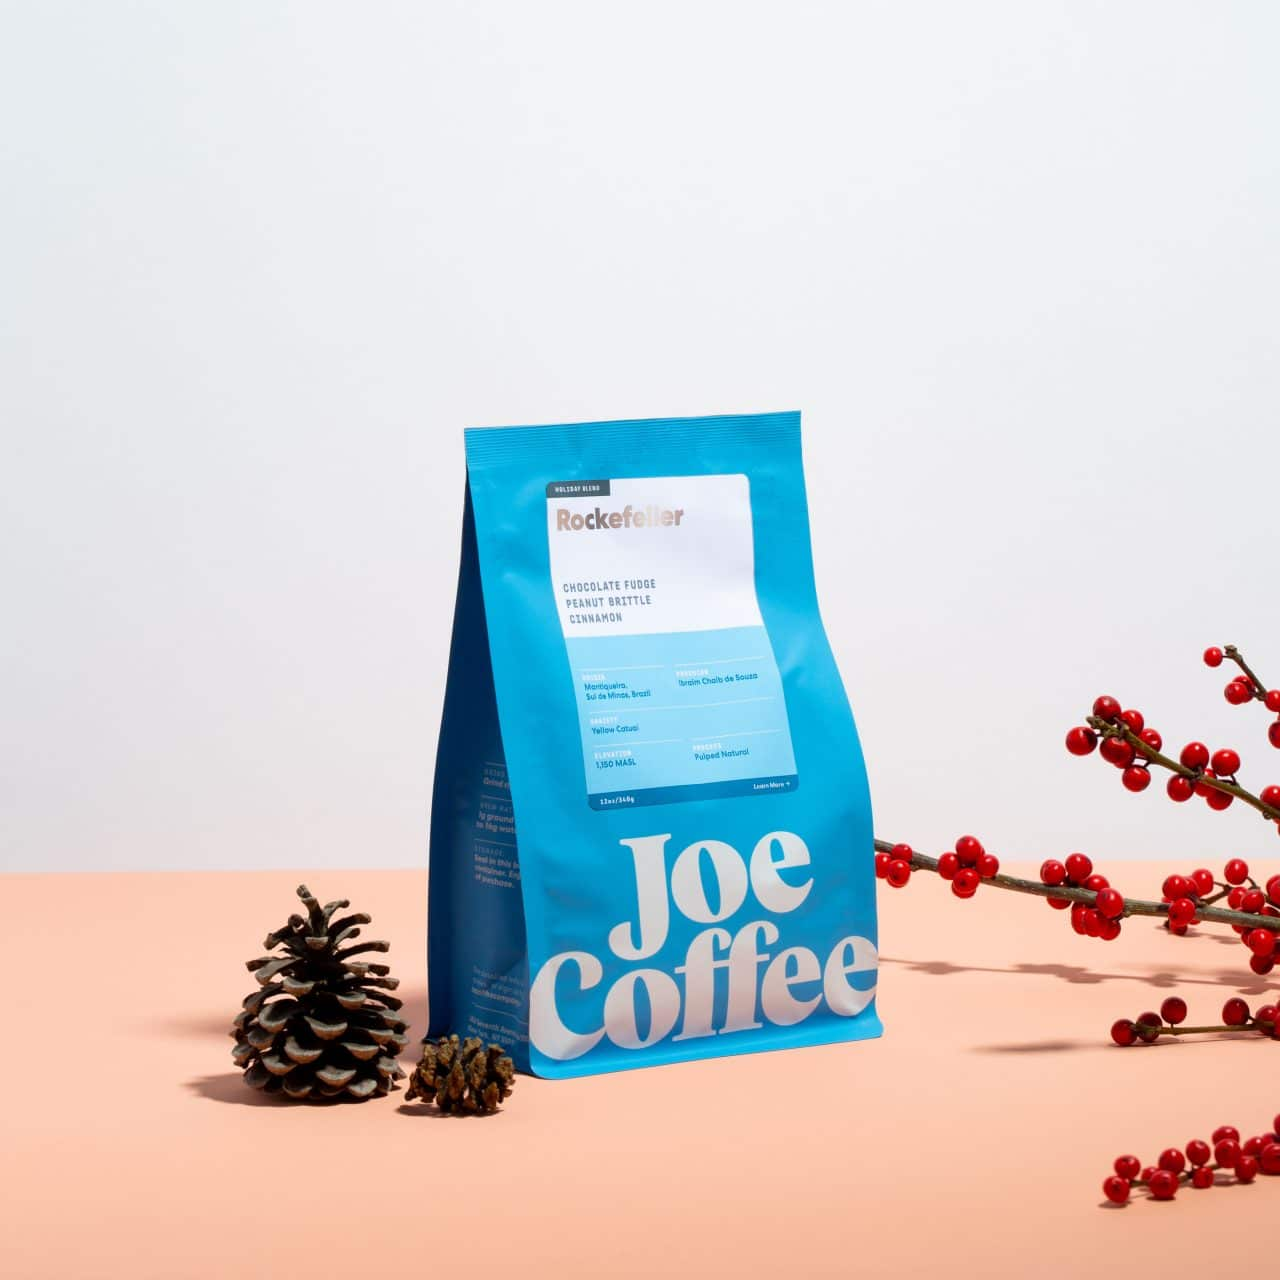 12oz bag of Rockefeller Coffee